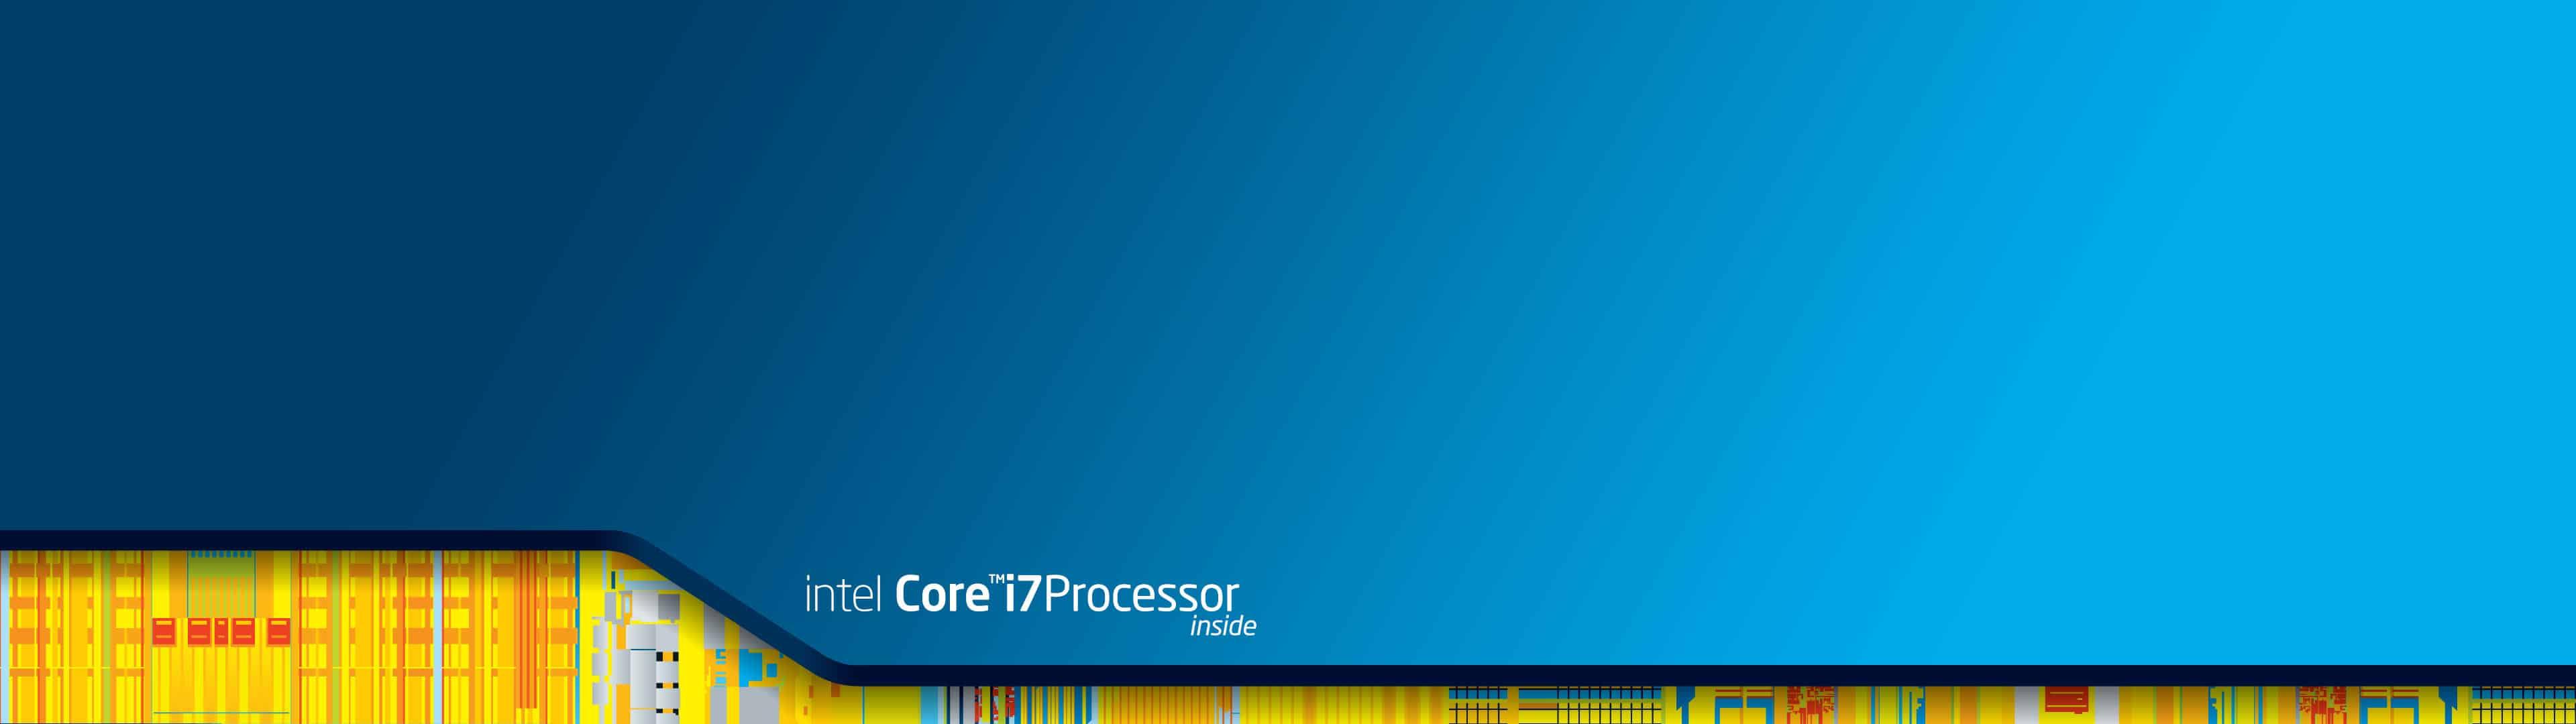 intel core i7 processor inside dual monitor wallpaper